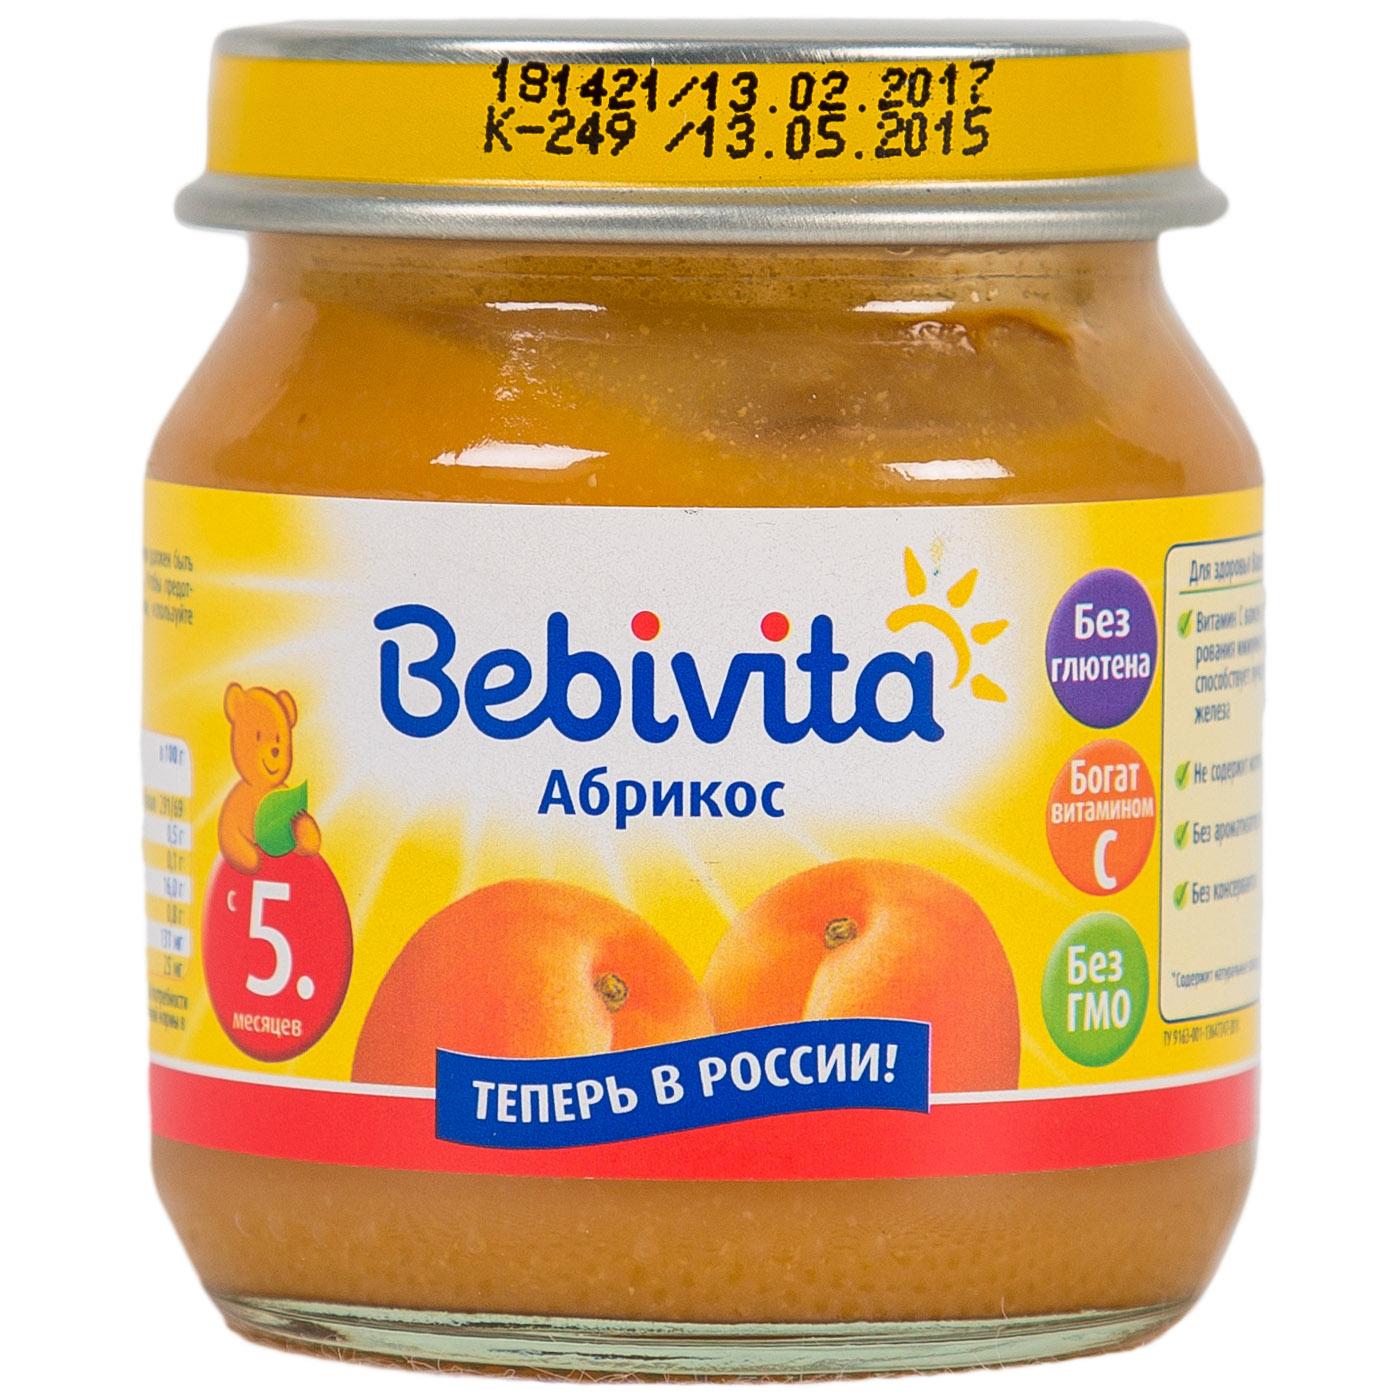 Пюре Bebivita фруктовое 100 гр Абрикос (с 5 мес)<br>